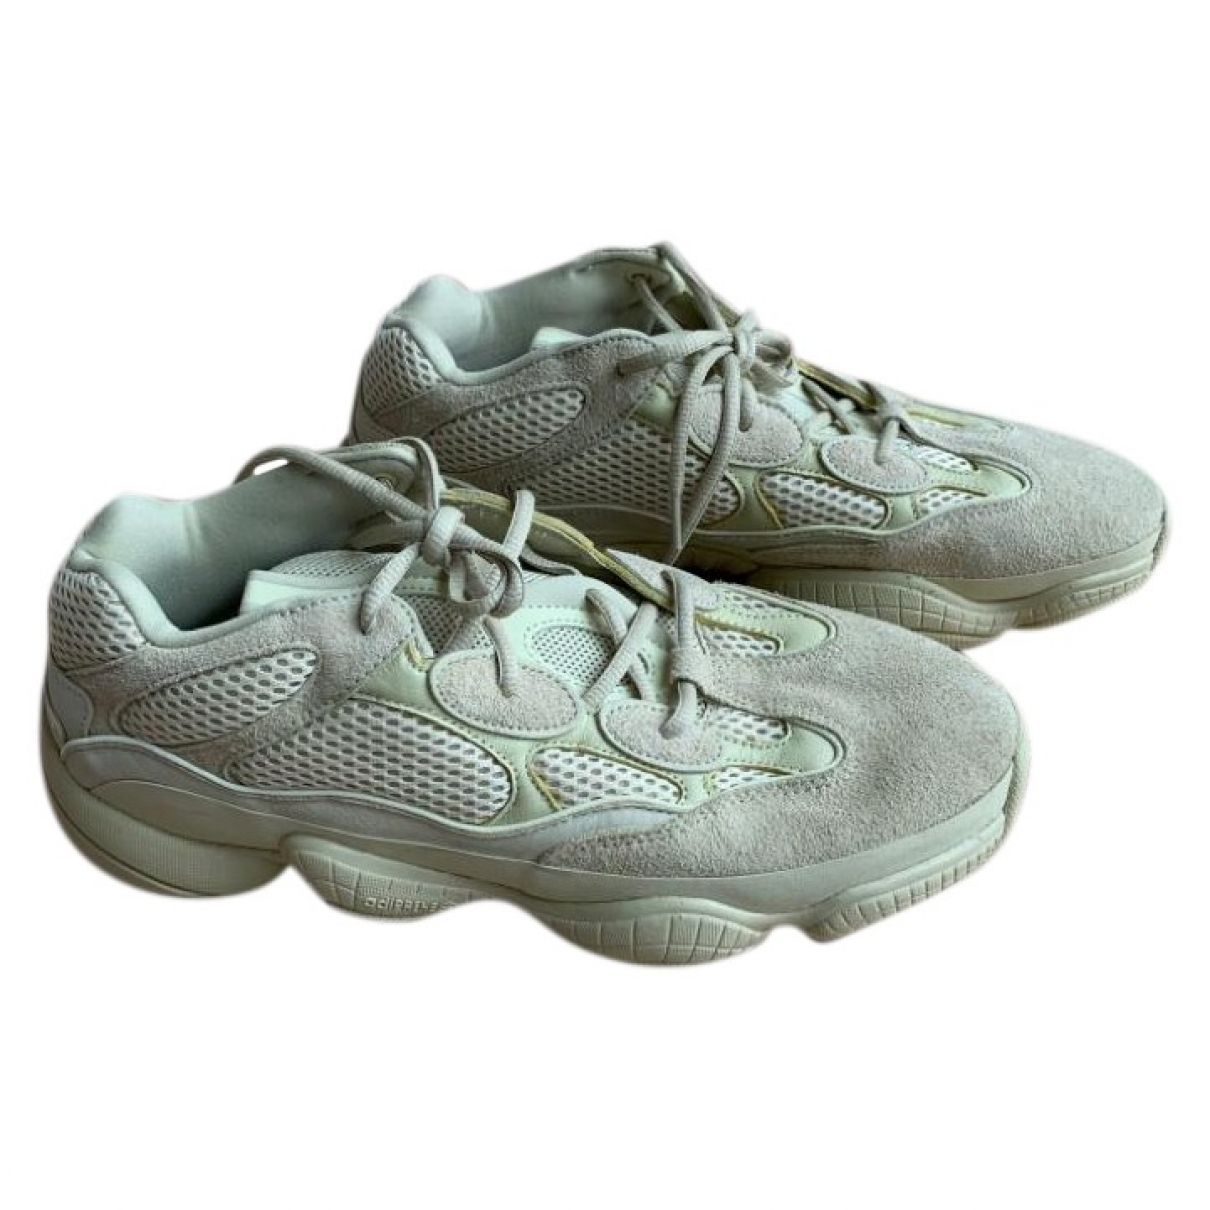 Yeezy X Adidas - Baskets 500 pour homme en suede